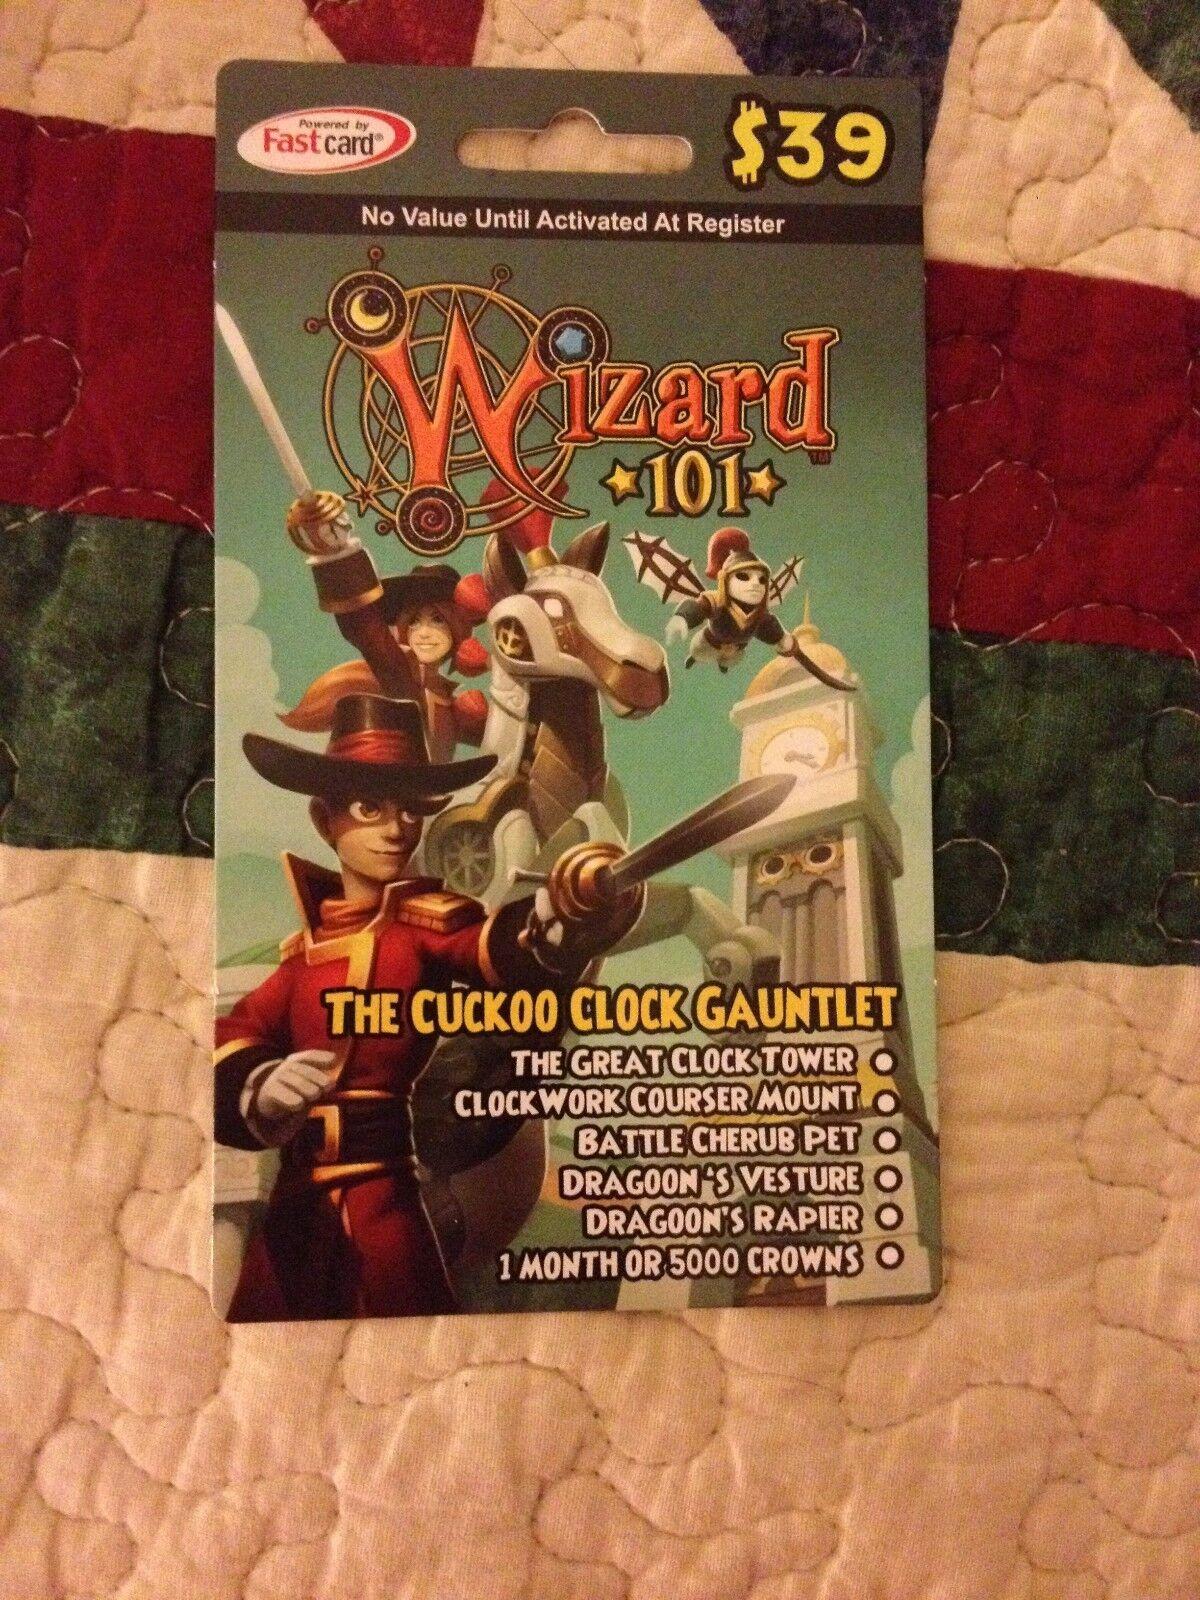 New Wizard 101 CUCKOO CLOCK GAUNTLET BUNDLE Card CROWNS Battle Cherub Pet - $65.98